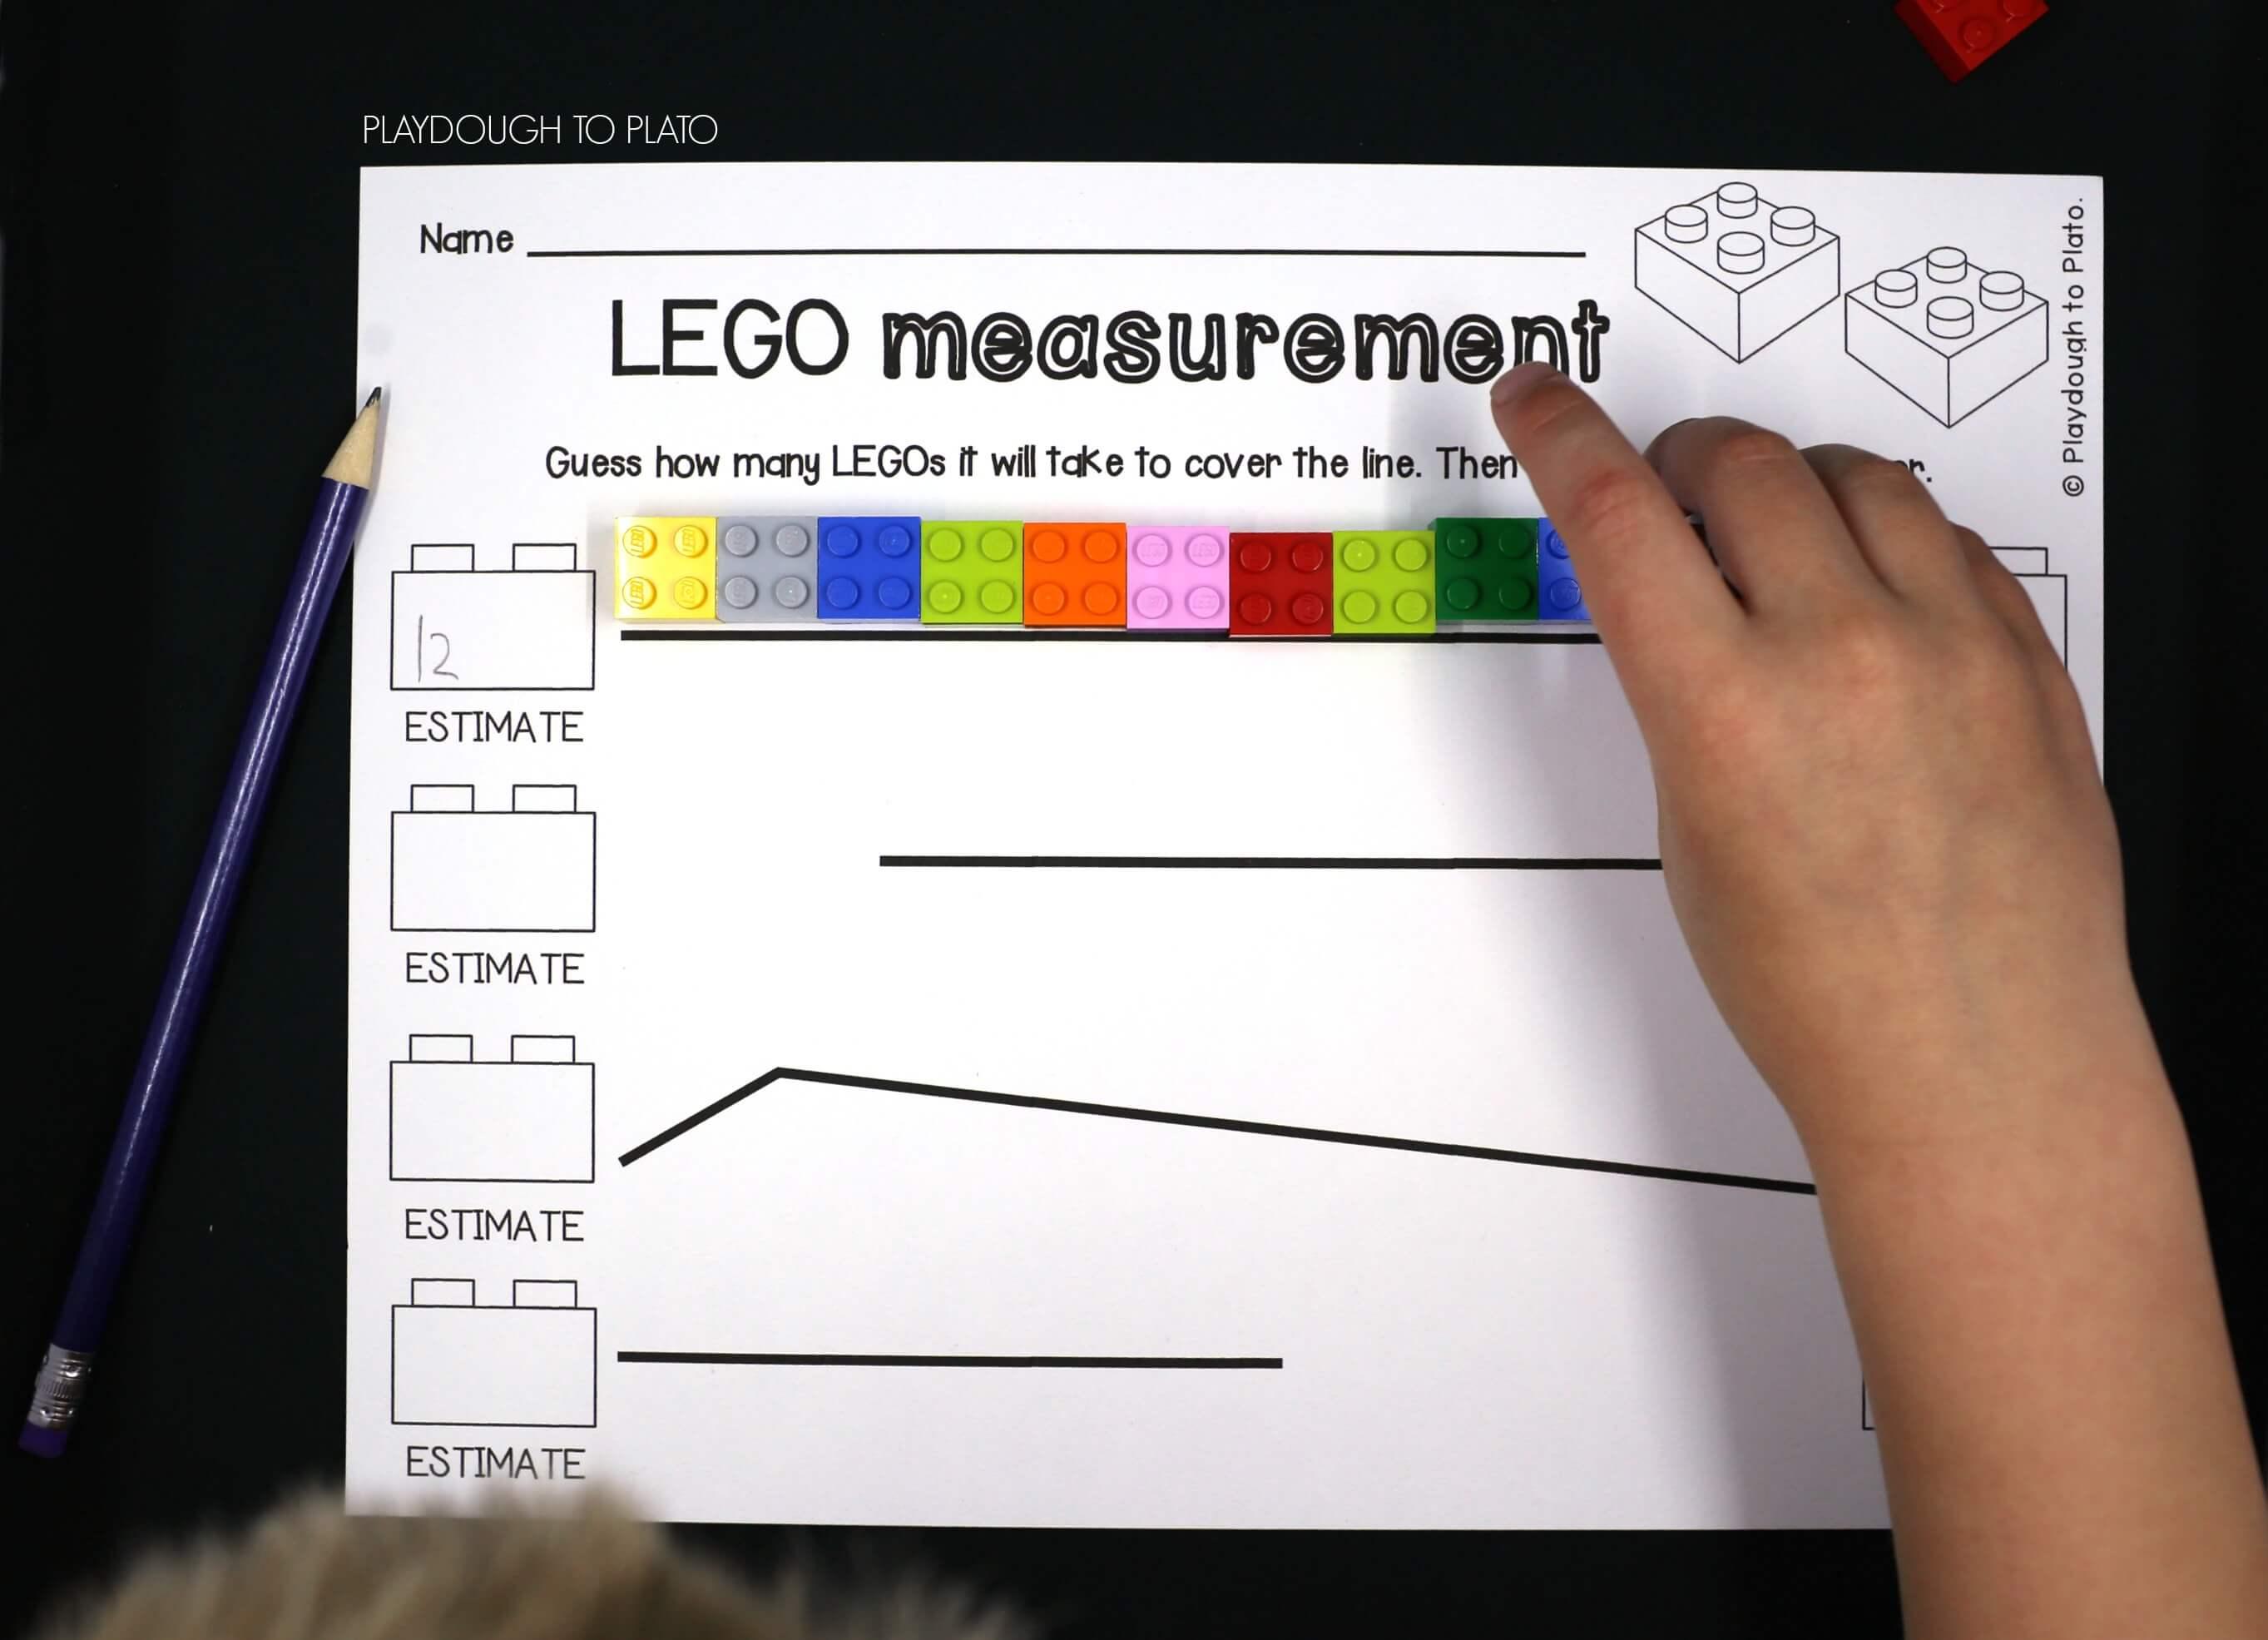 LEGO Measurement - Playdough To Plato